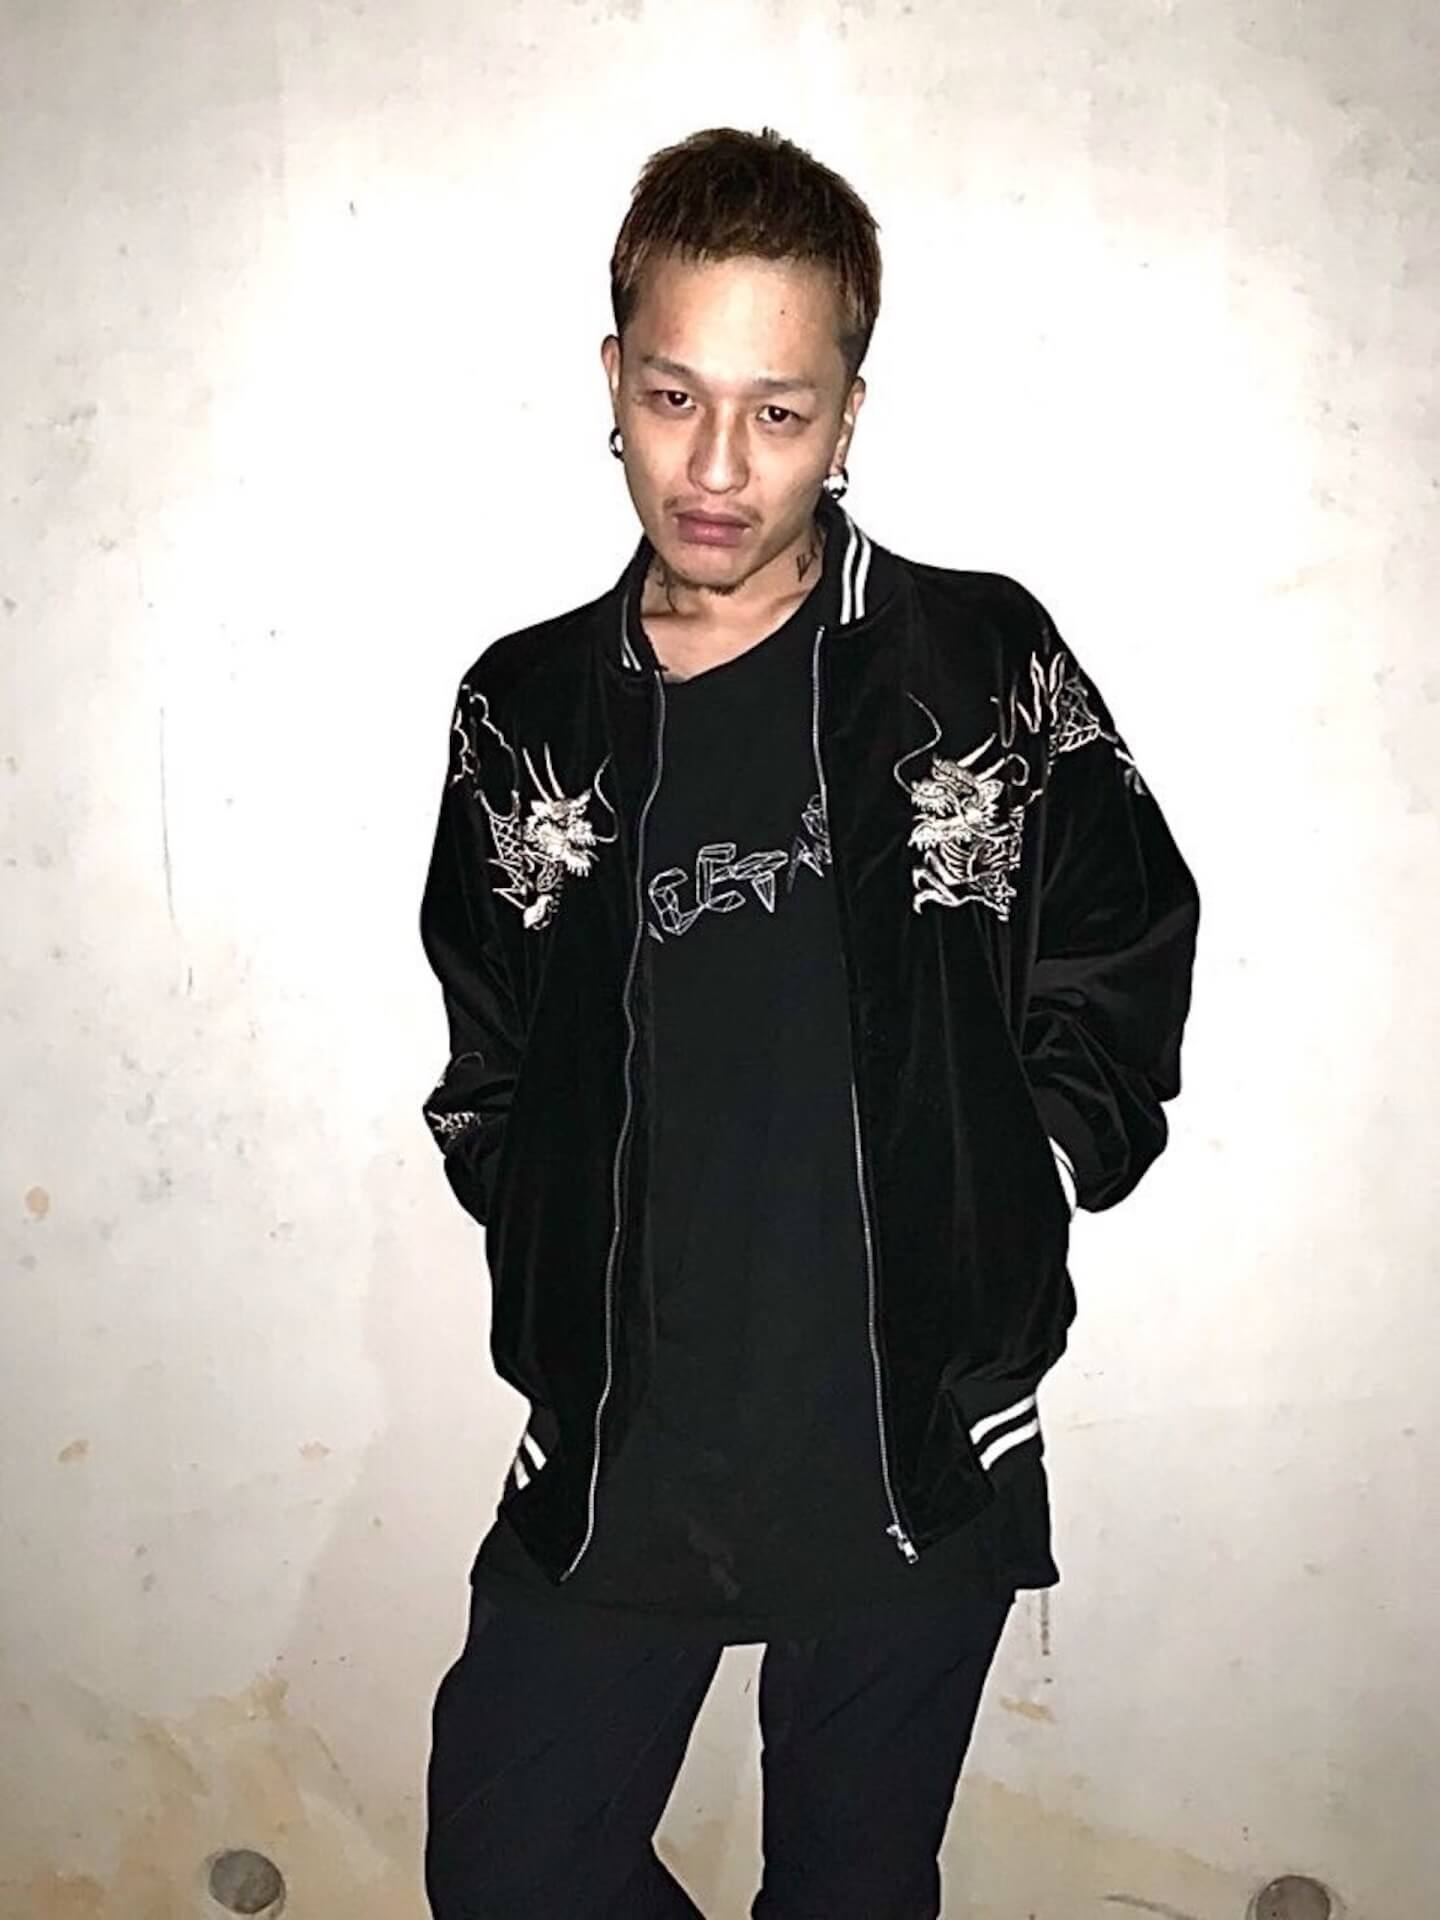 Jin Doggの最新アルバムツアー<SAD MAD TOUR 2020>東京公演が7月開催に延期 music200408_jindogg_3